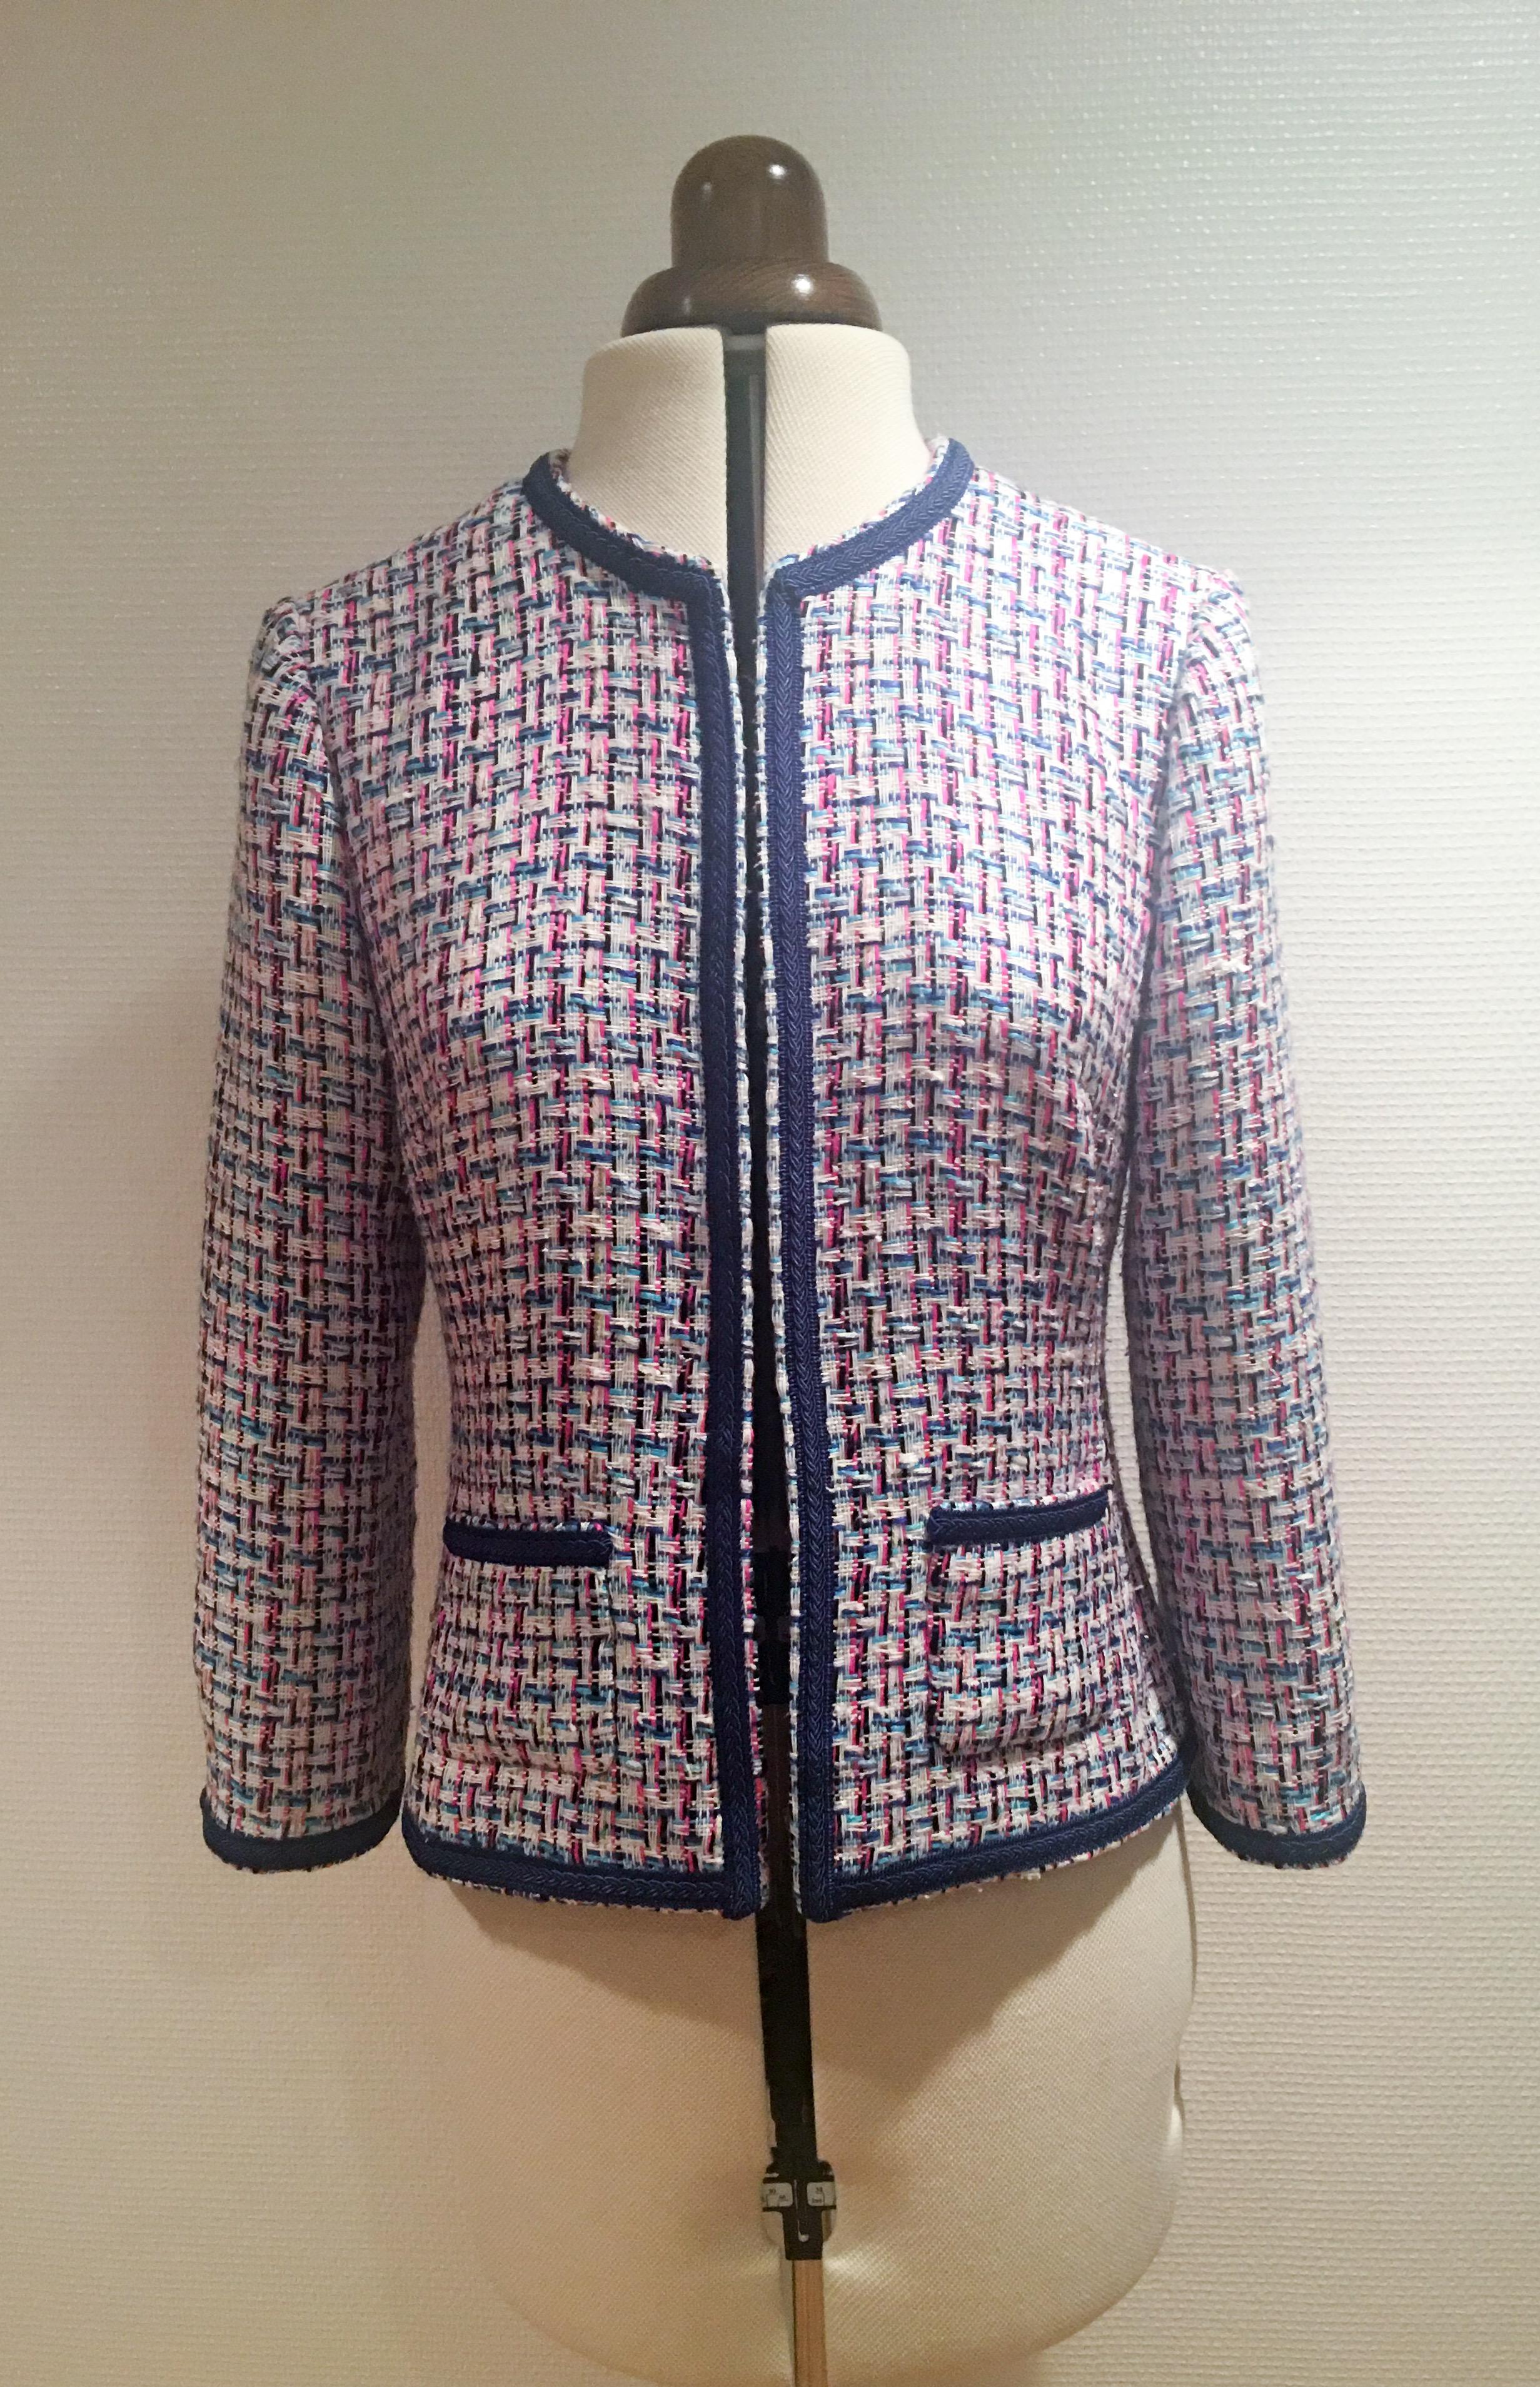 f3b9768aaf29 CHANEL INSPIRED JACKET - Antoinette Dresses Sweden Silk dresses for all  occasions